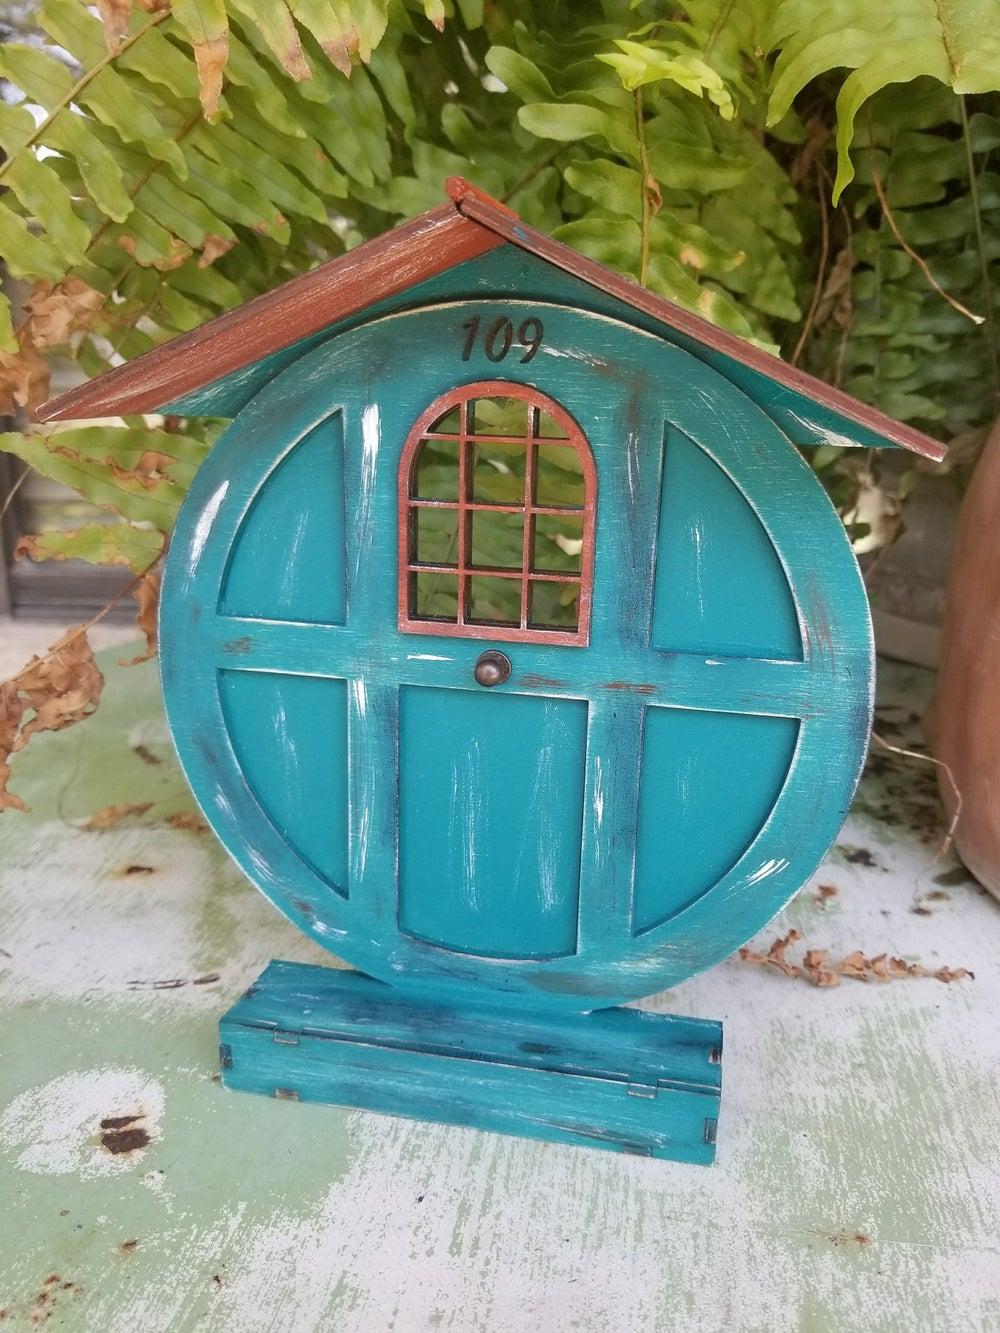 Image of #109 Fairy Lane-Fairy Door Wood Kit